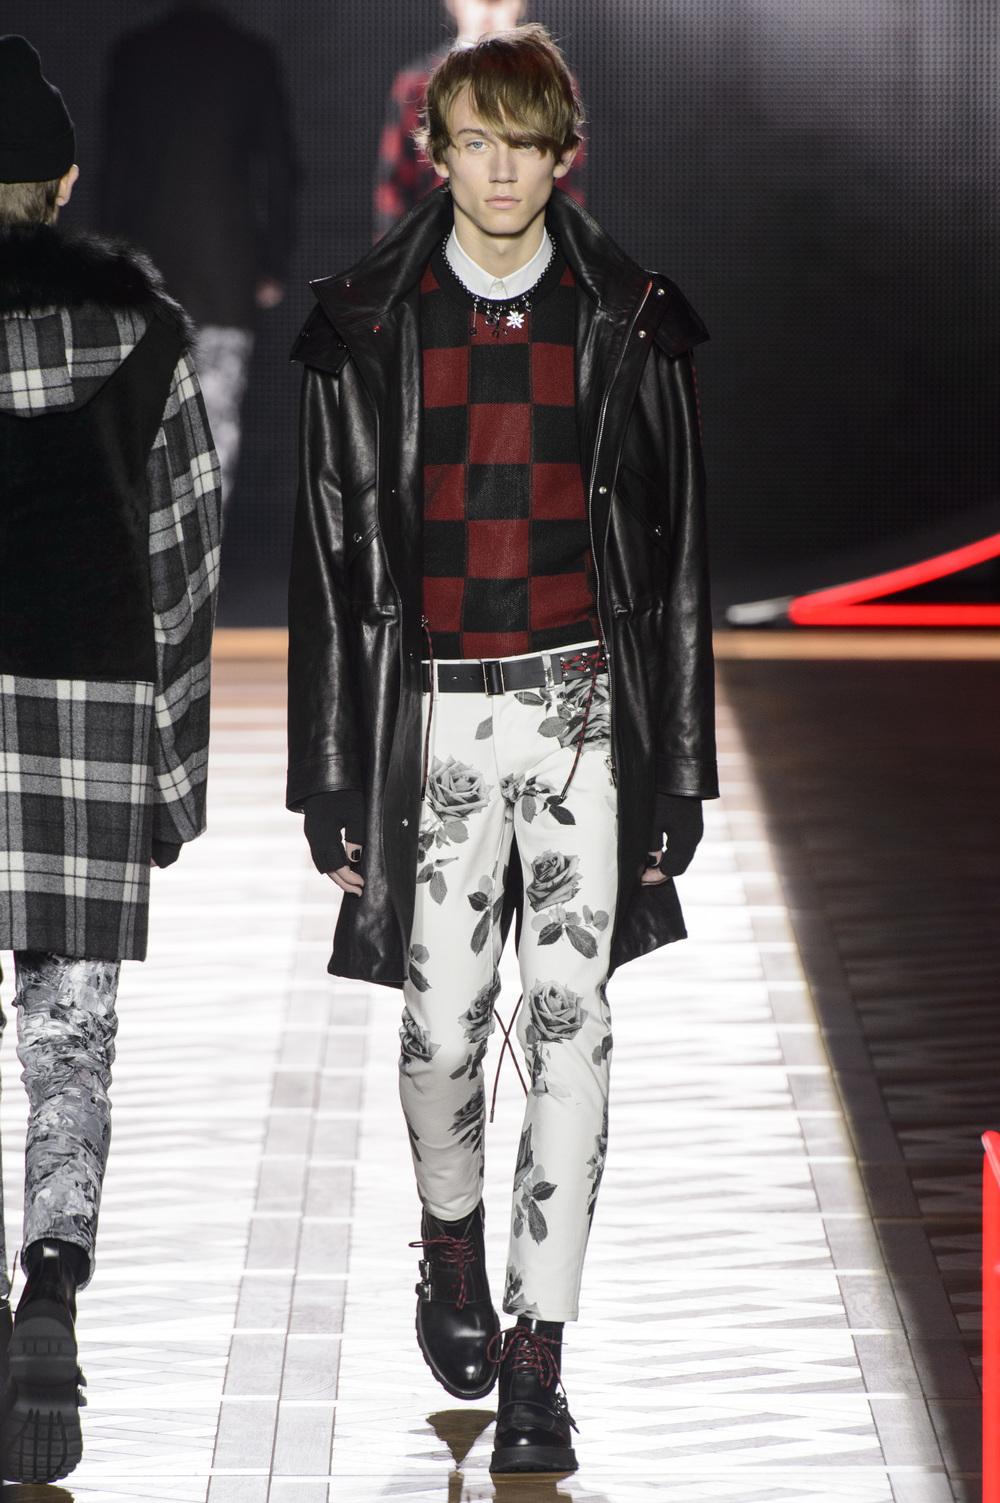 Dior_Homme_Hiver2016-17_look_43.JPG